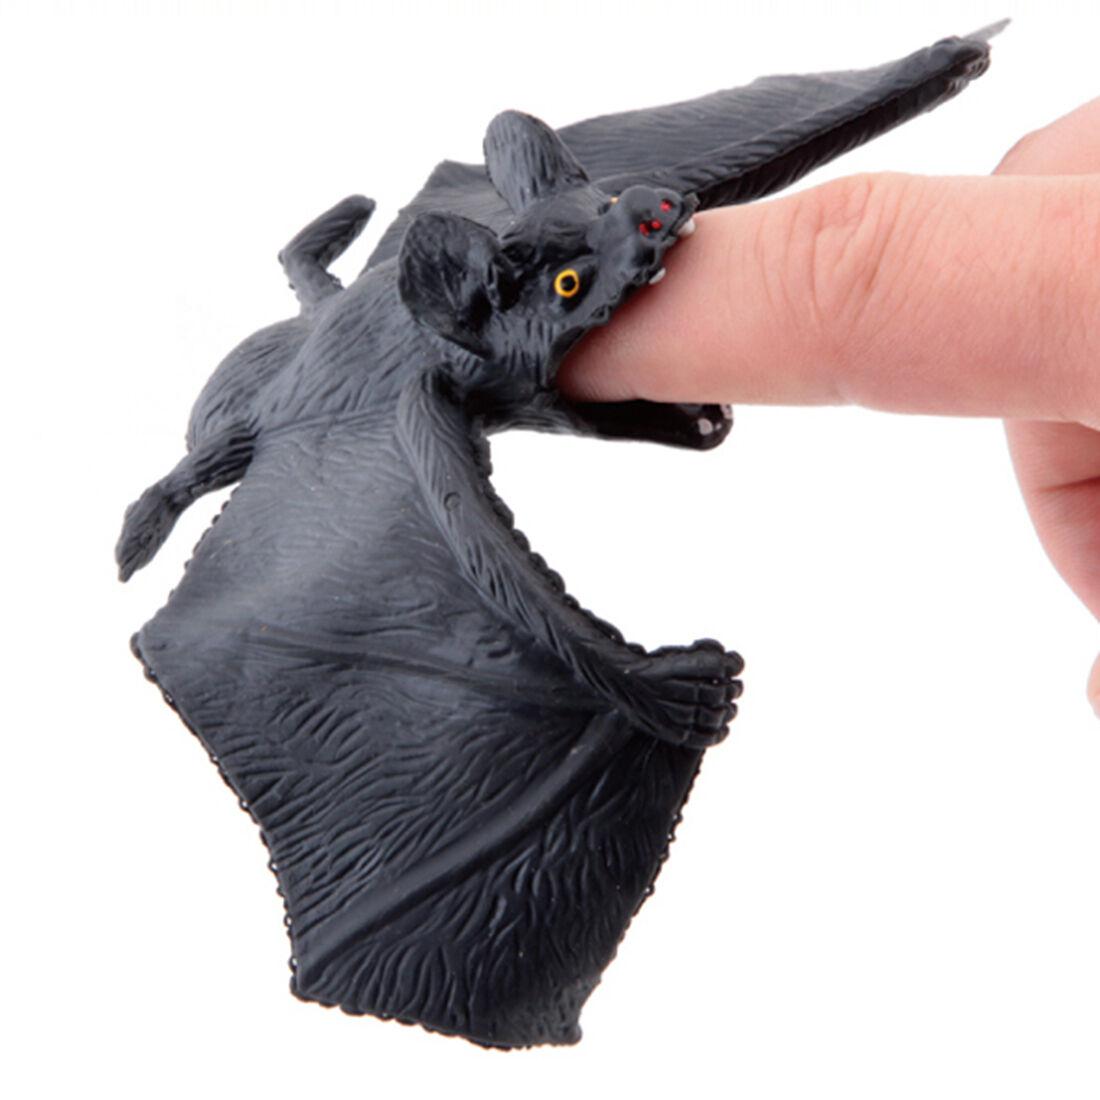 5Pcs Flexible Plastic Simulation Spiders Black Joke Prank Toy Halloween Gifts YF